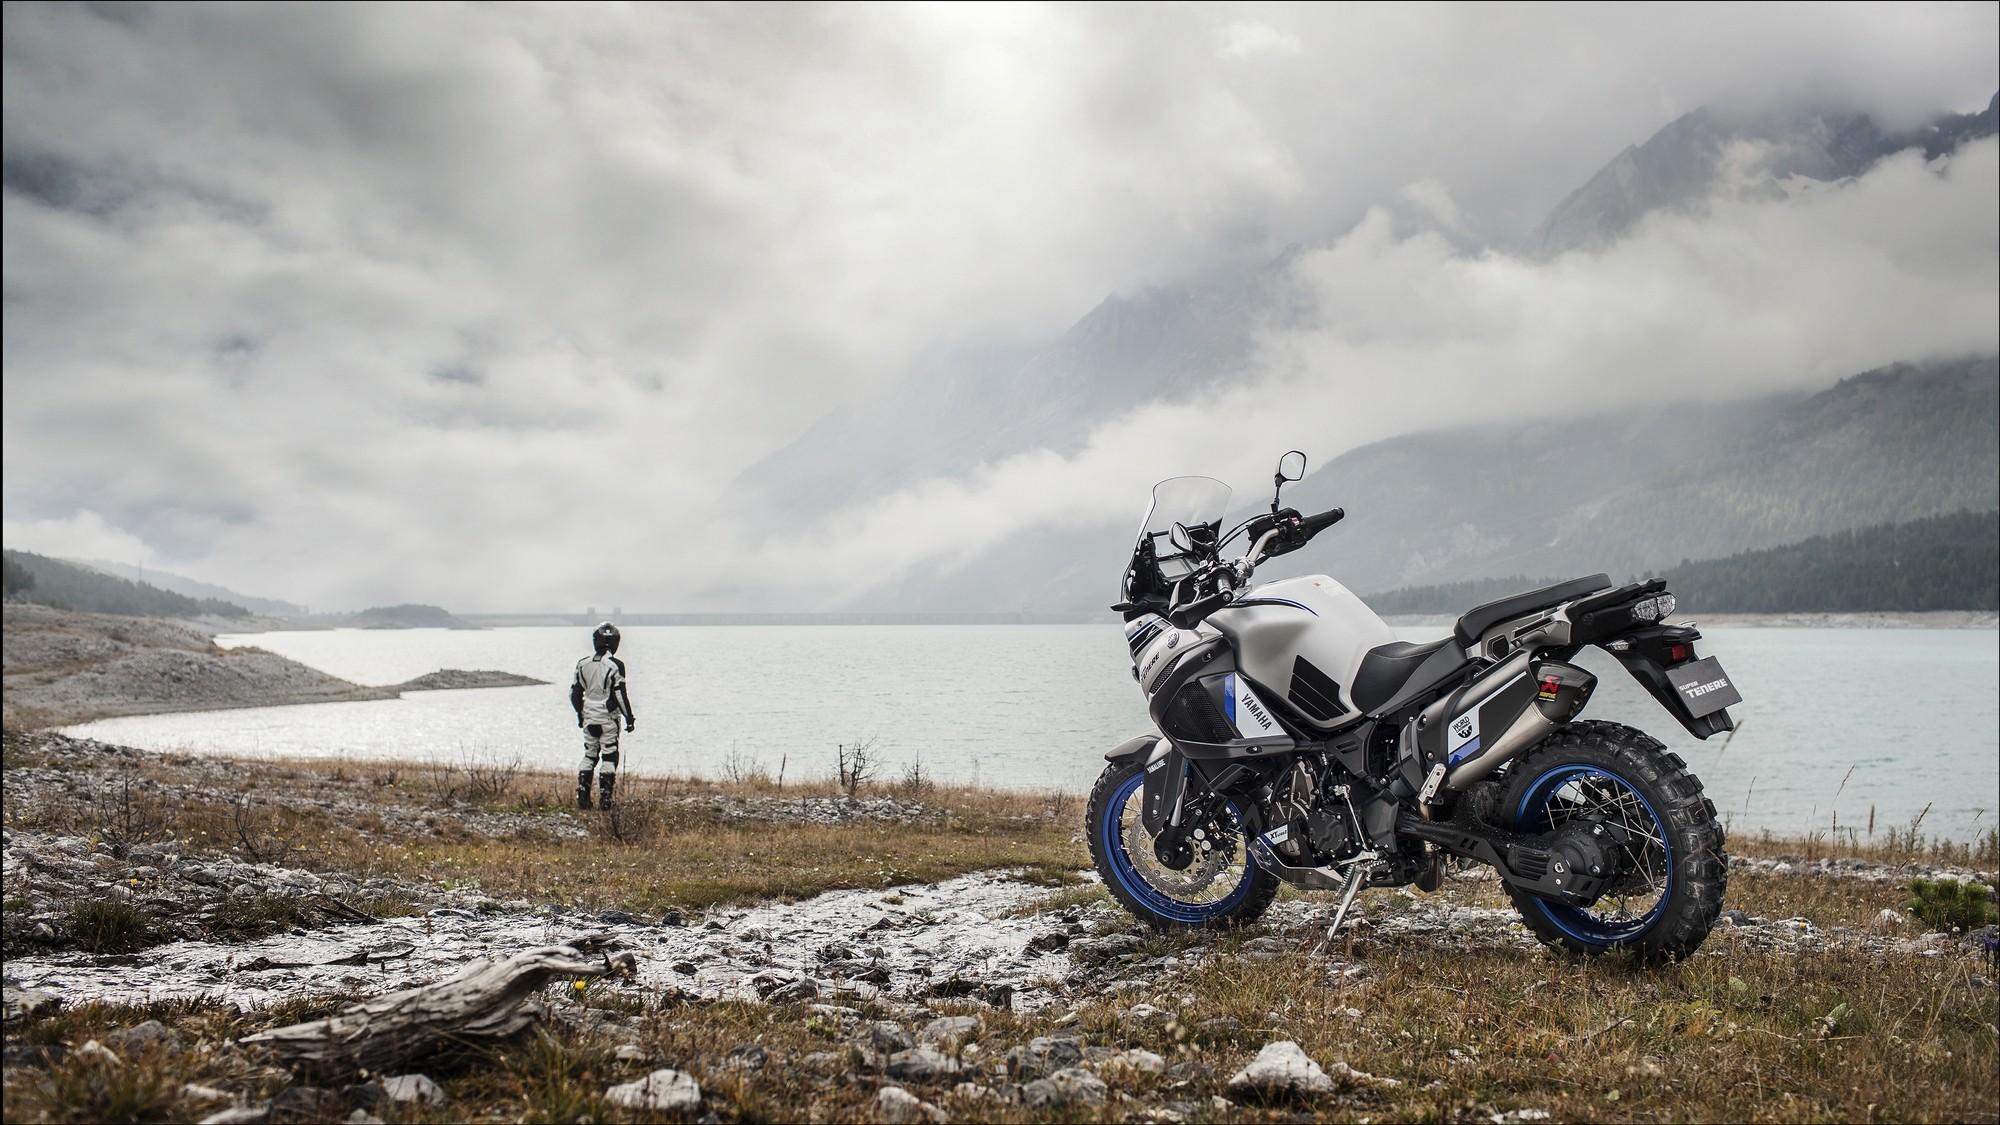 European Auto Works >> 2015 Yamaha Super Ténéré Worldcrosser Looks Like Serious Business - autoevolution